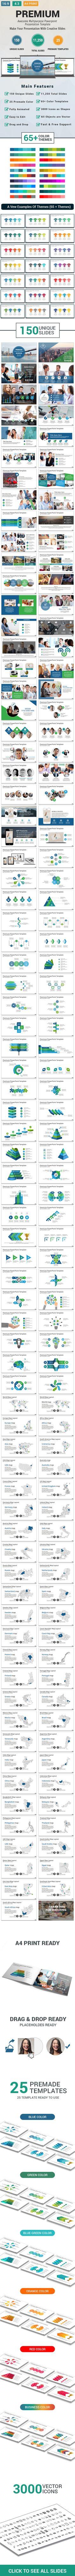 Premium Multipurpose PowerPoint Presentation Template - Business PowerPoint Templates